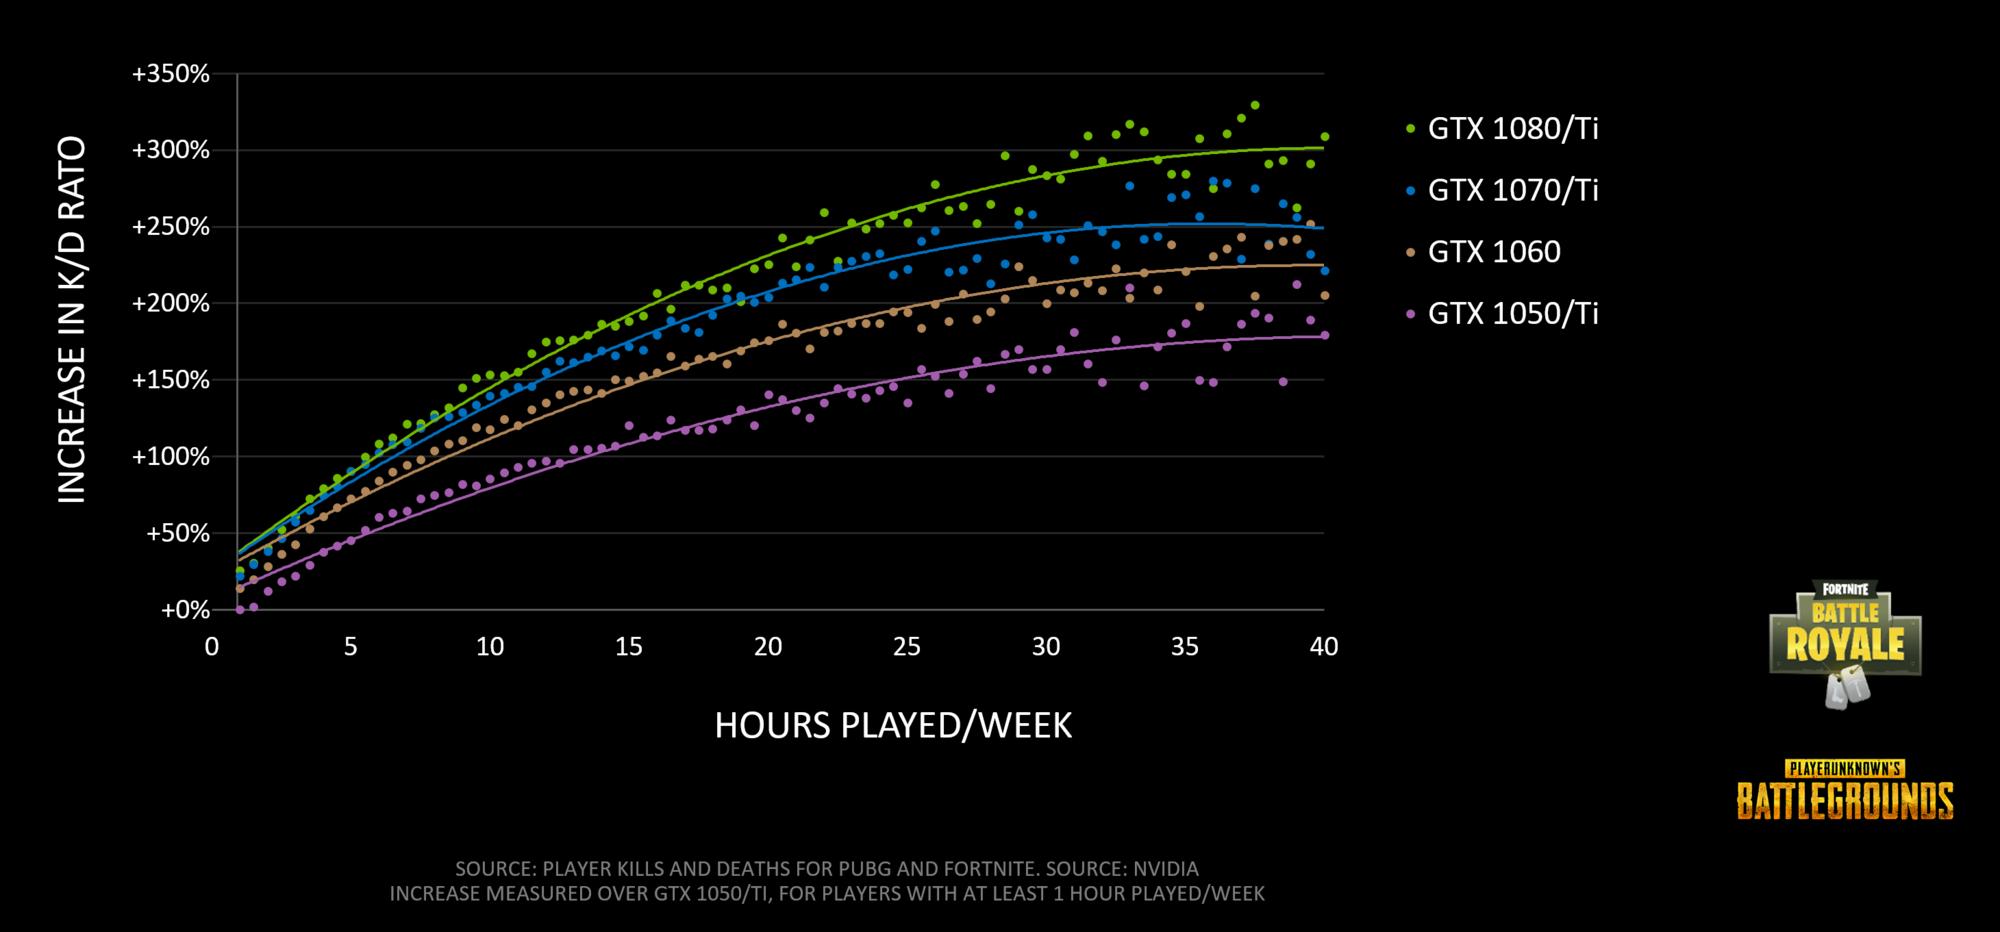 battle-royale-fortnite-pubg-increase-in-kd-hours.png